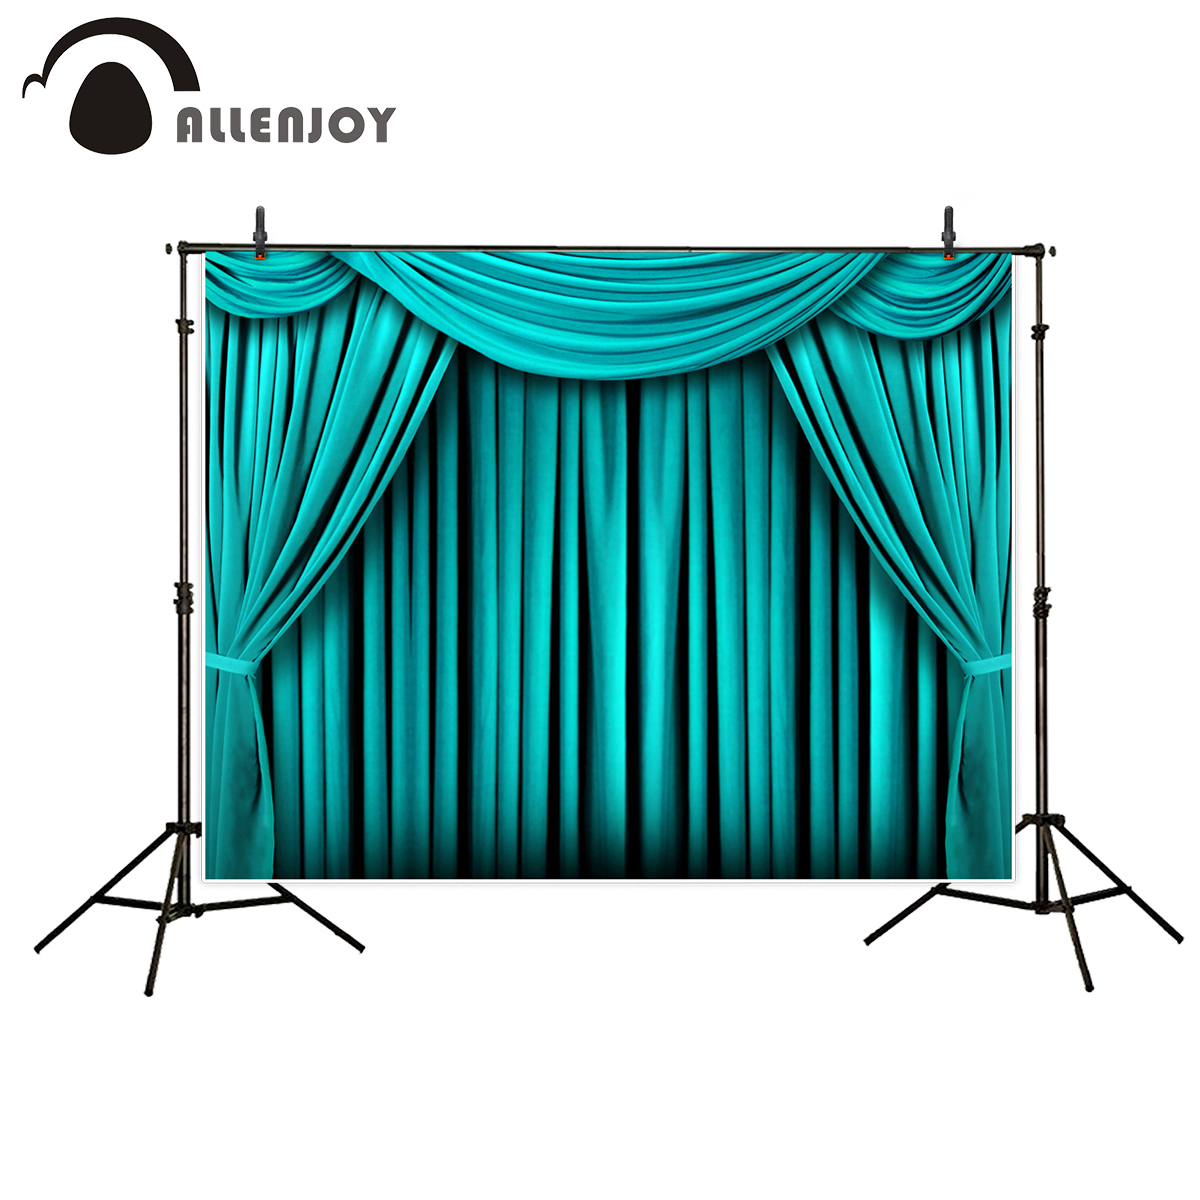 Allenjoy Vinyl chromakey photography wedding backdrops aquamarine stage curtain festival celebration photographic background 10 6 5feet 300 200cm photography backdrops red wedding candles chromakey free shipping